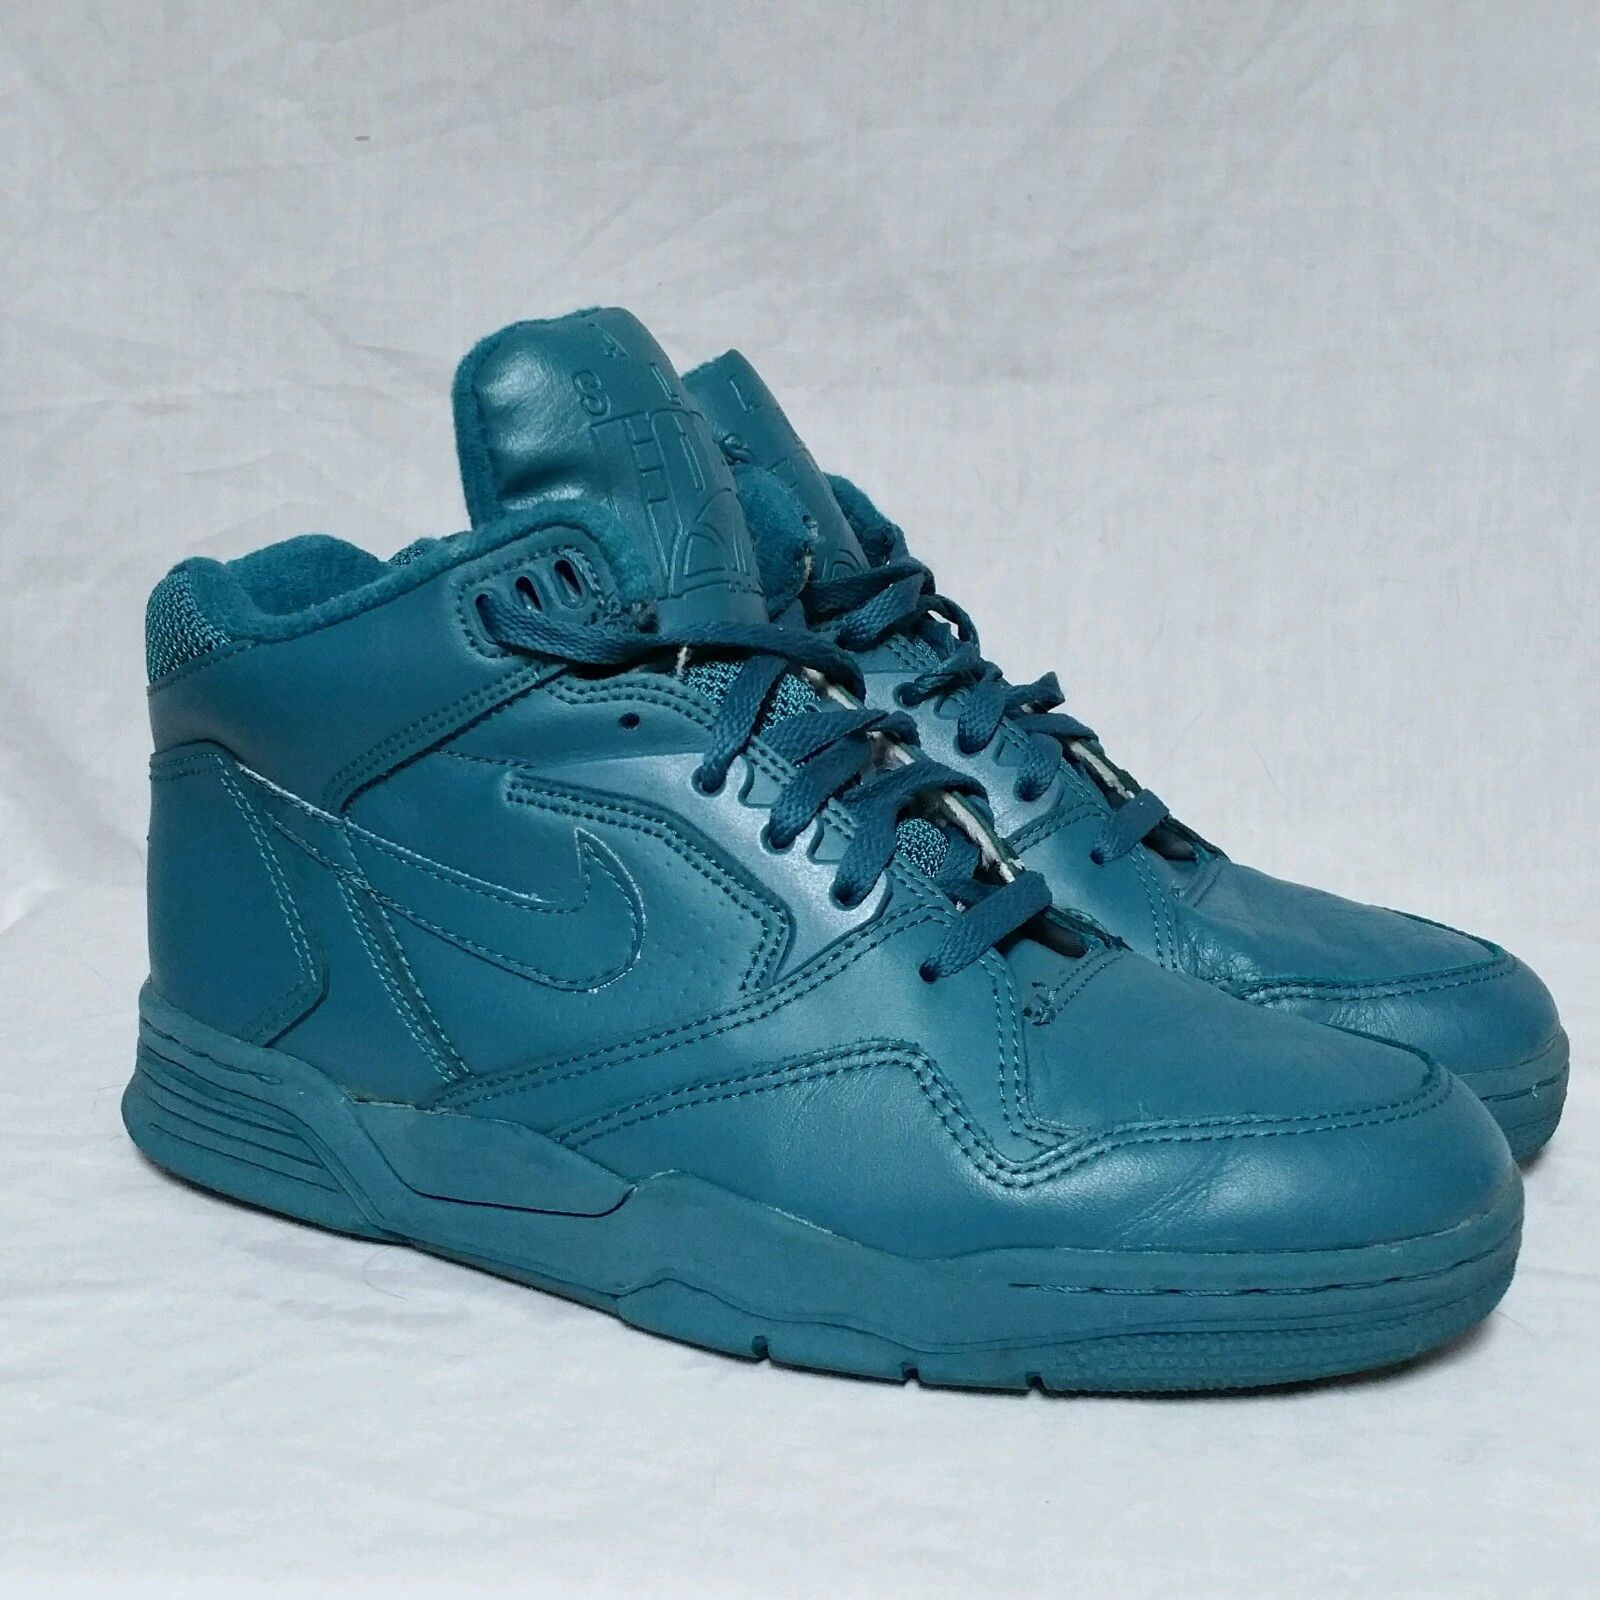 save off 04761 6b378 VTG 1990 Nike Air Slam Force 901012 80 s OG and 50 similar items. S l1600